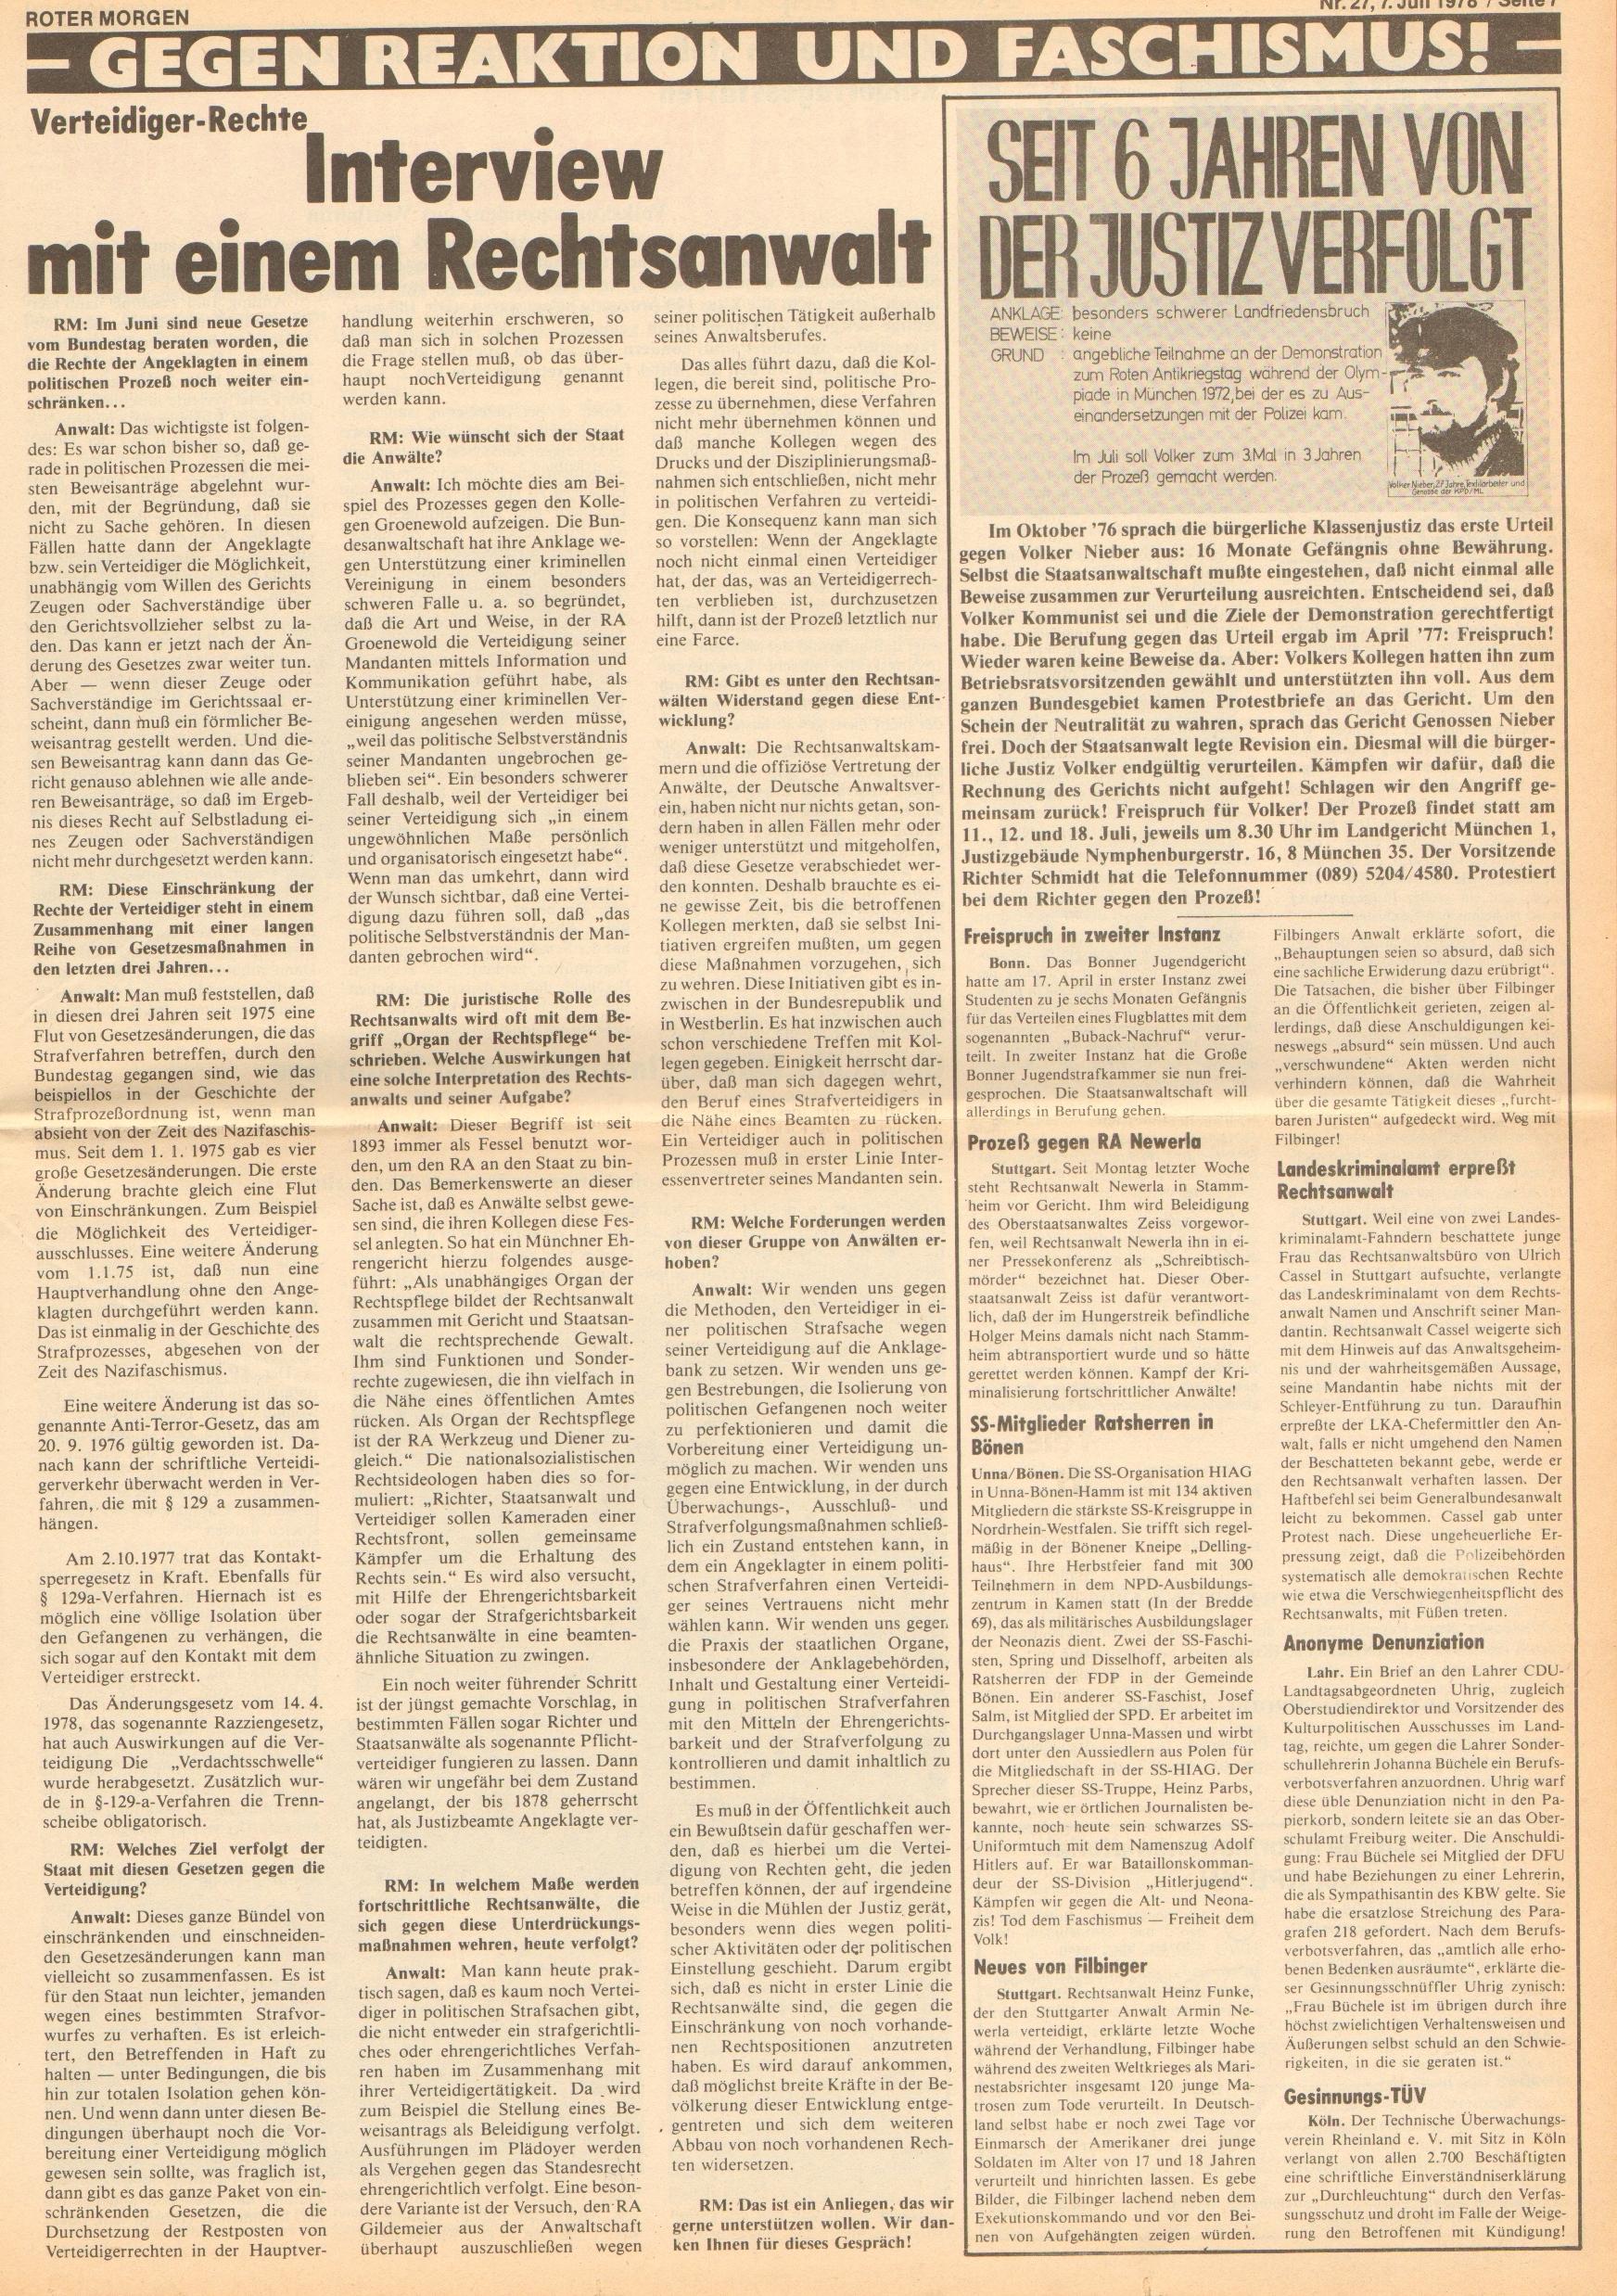 Roter Morgen, 12. Jg., 7. Juli 1978, Nr. 27, Seite 7